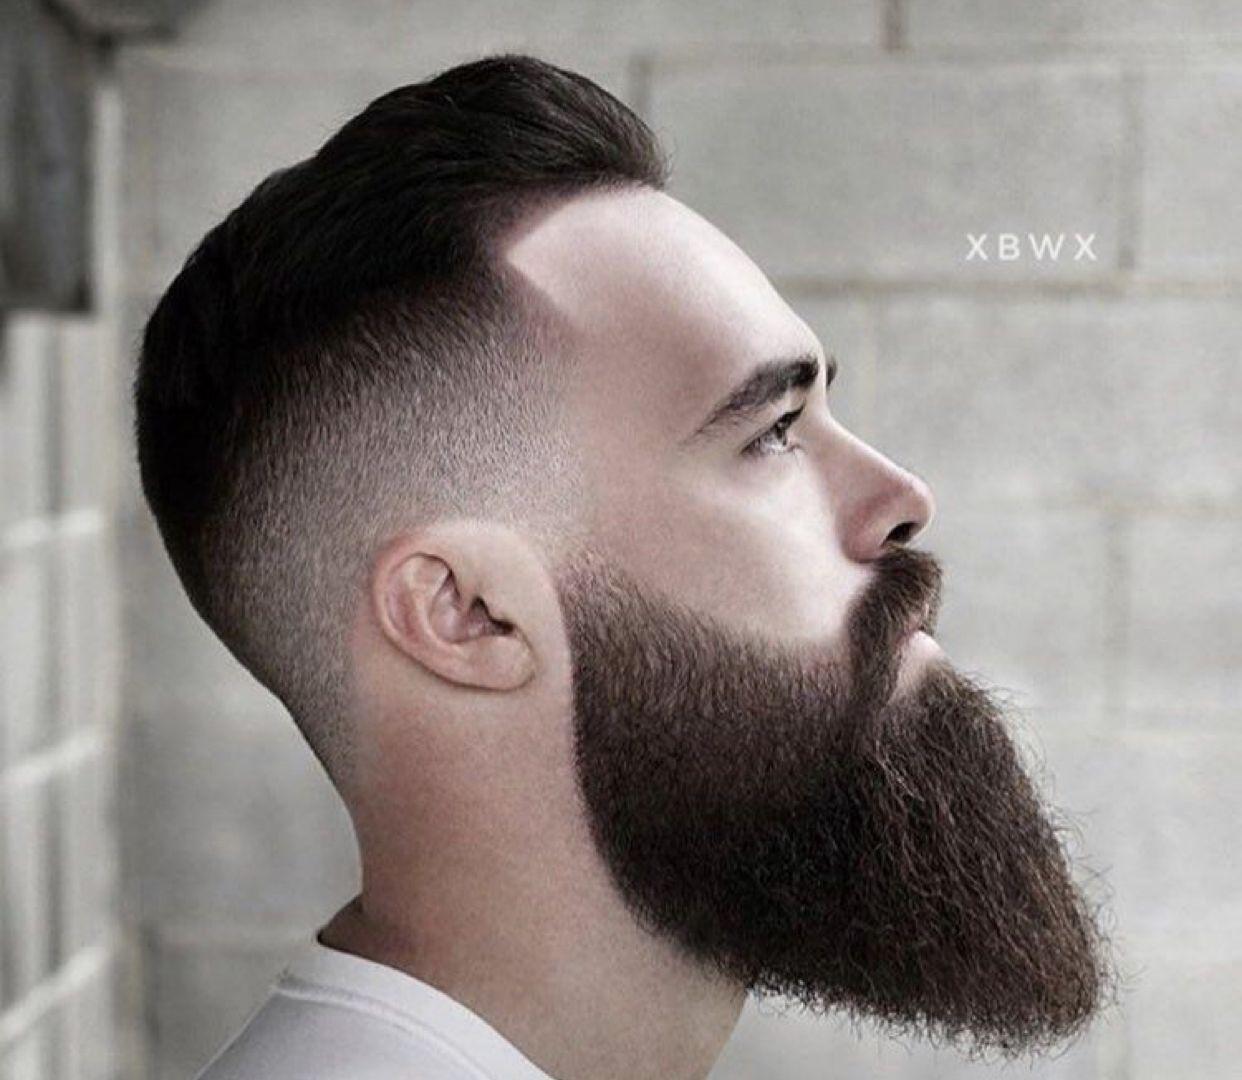 Rocking Long Beard Long Beard Styles Beard Shapes Beard Styles